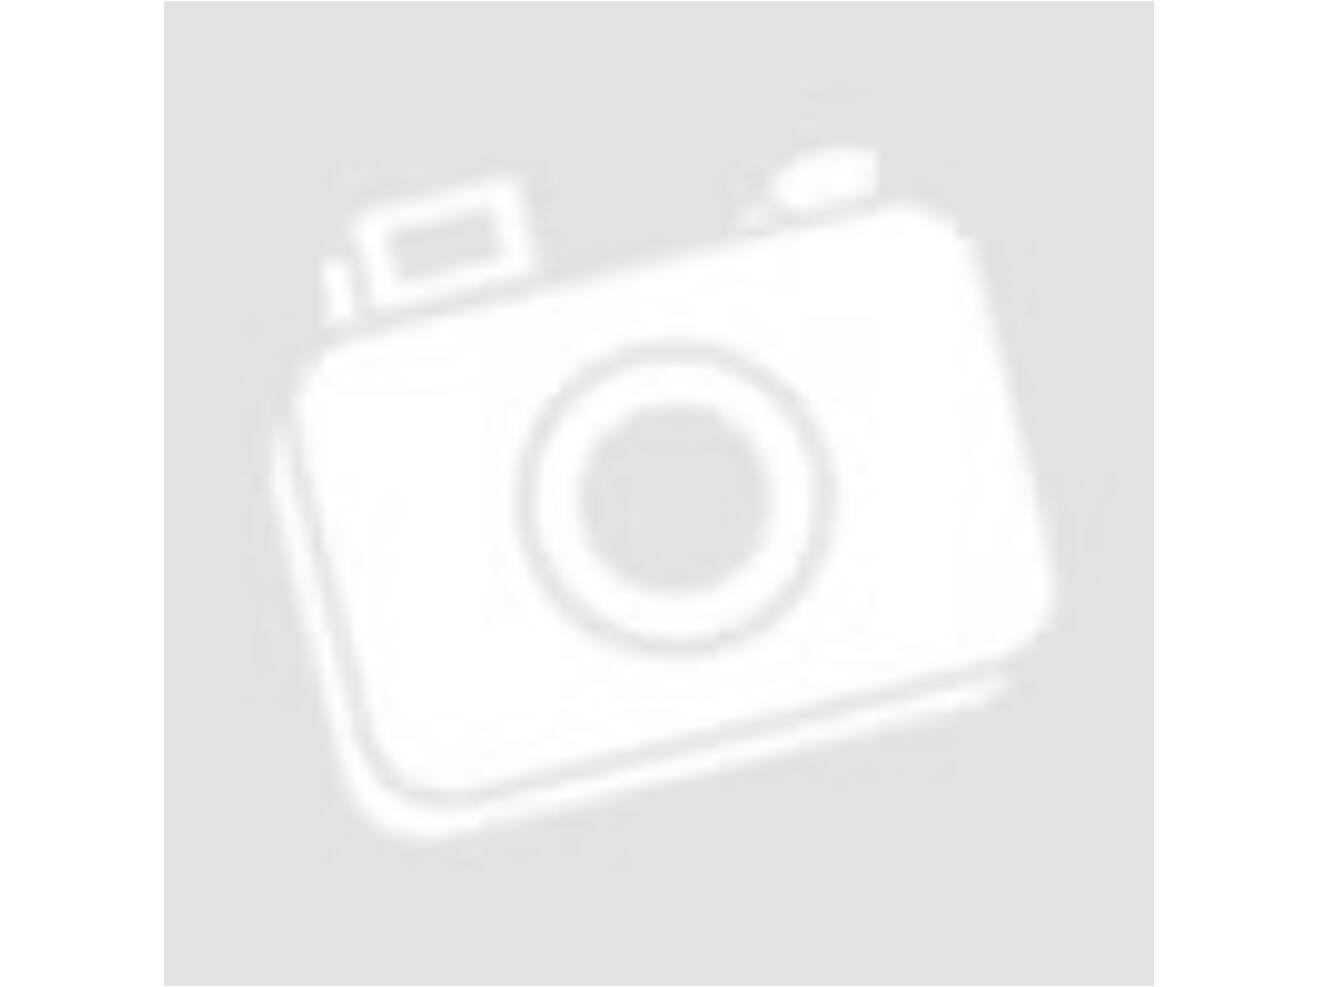 NIKE MAGISTA OBRA II AG-PRO - FG AG (Műanyag stoplis) - Alexandersoccershoes 4abb7b5fd4